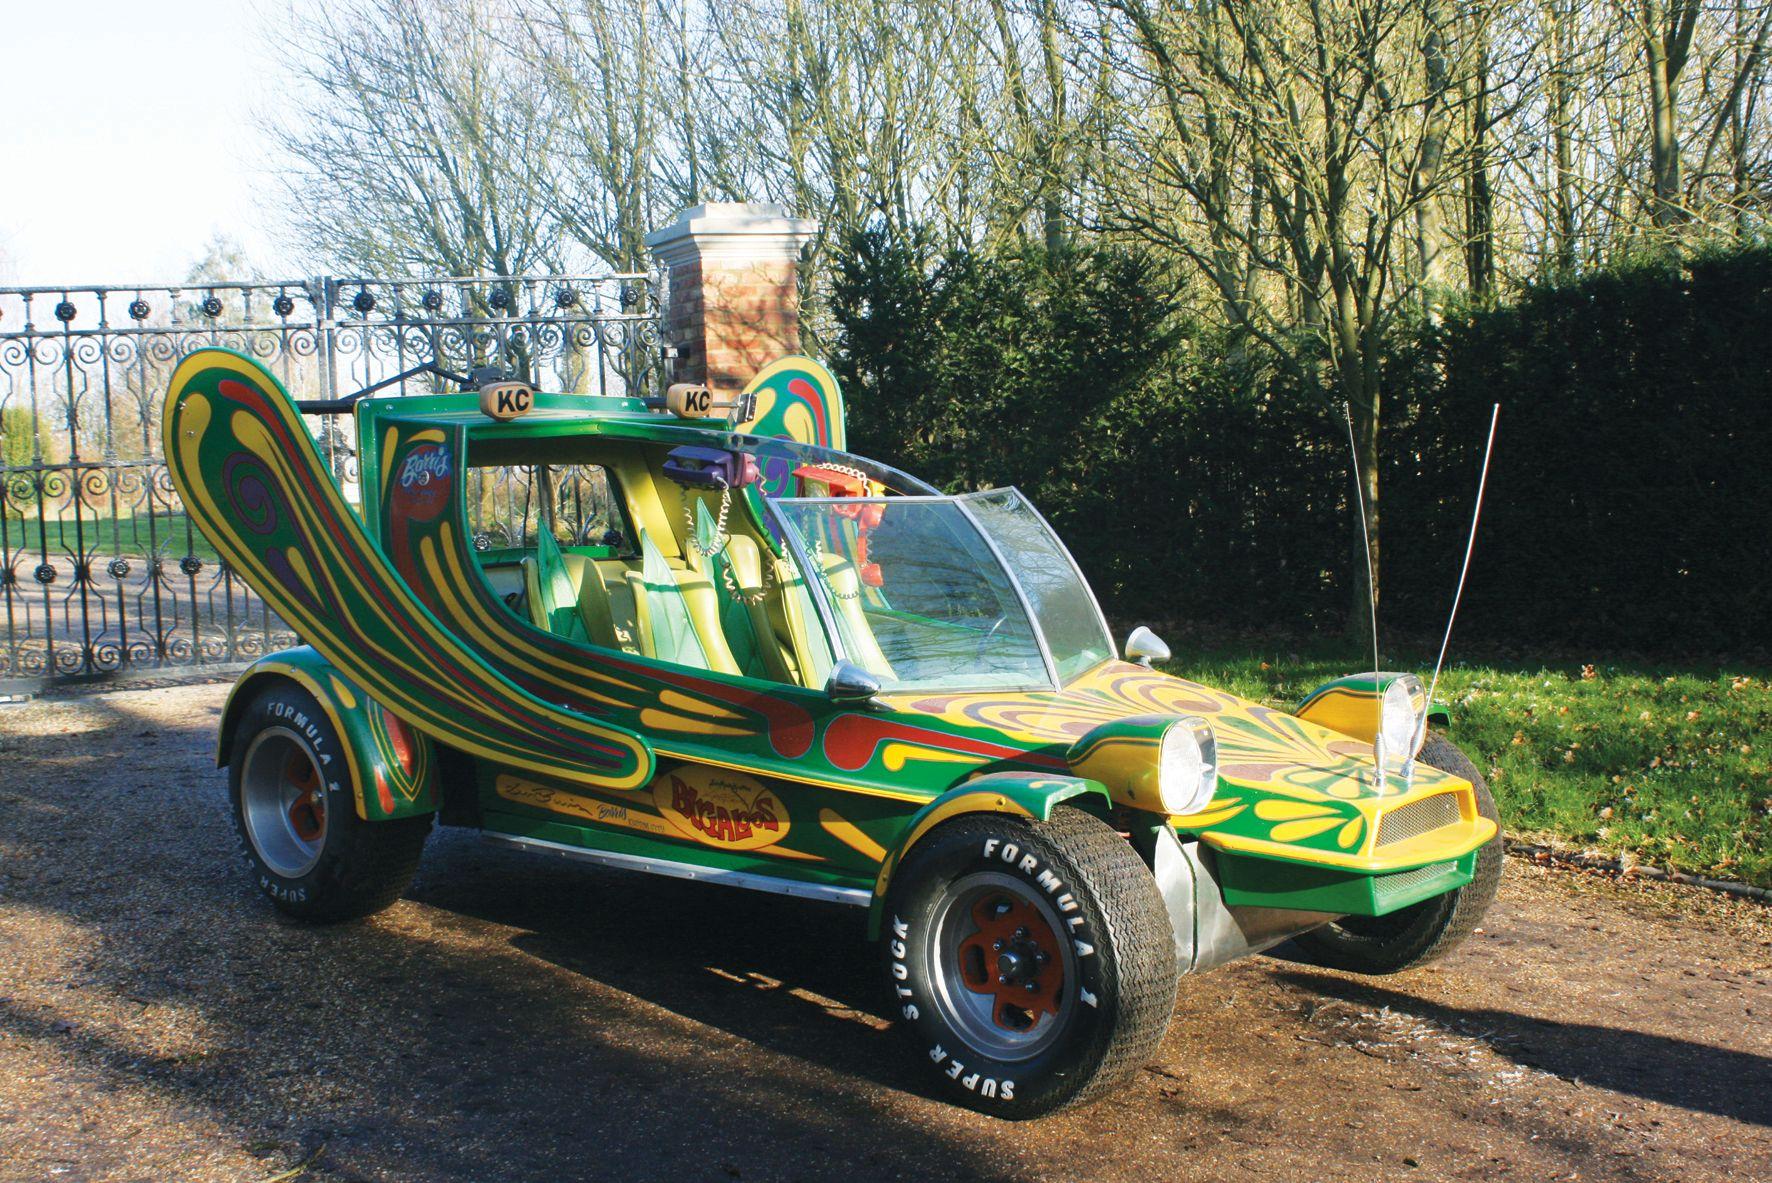 custom car  Whacky Custom Cars For Sale In The UK  My Custom